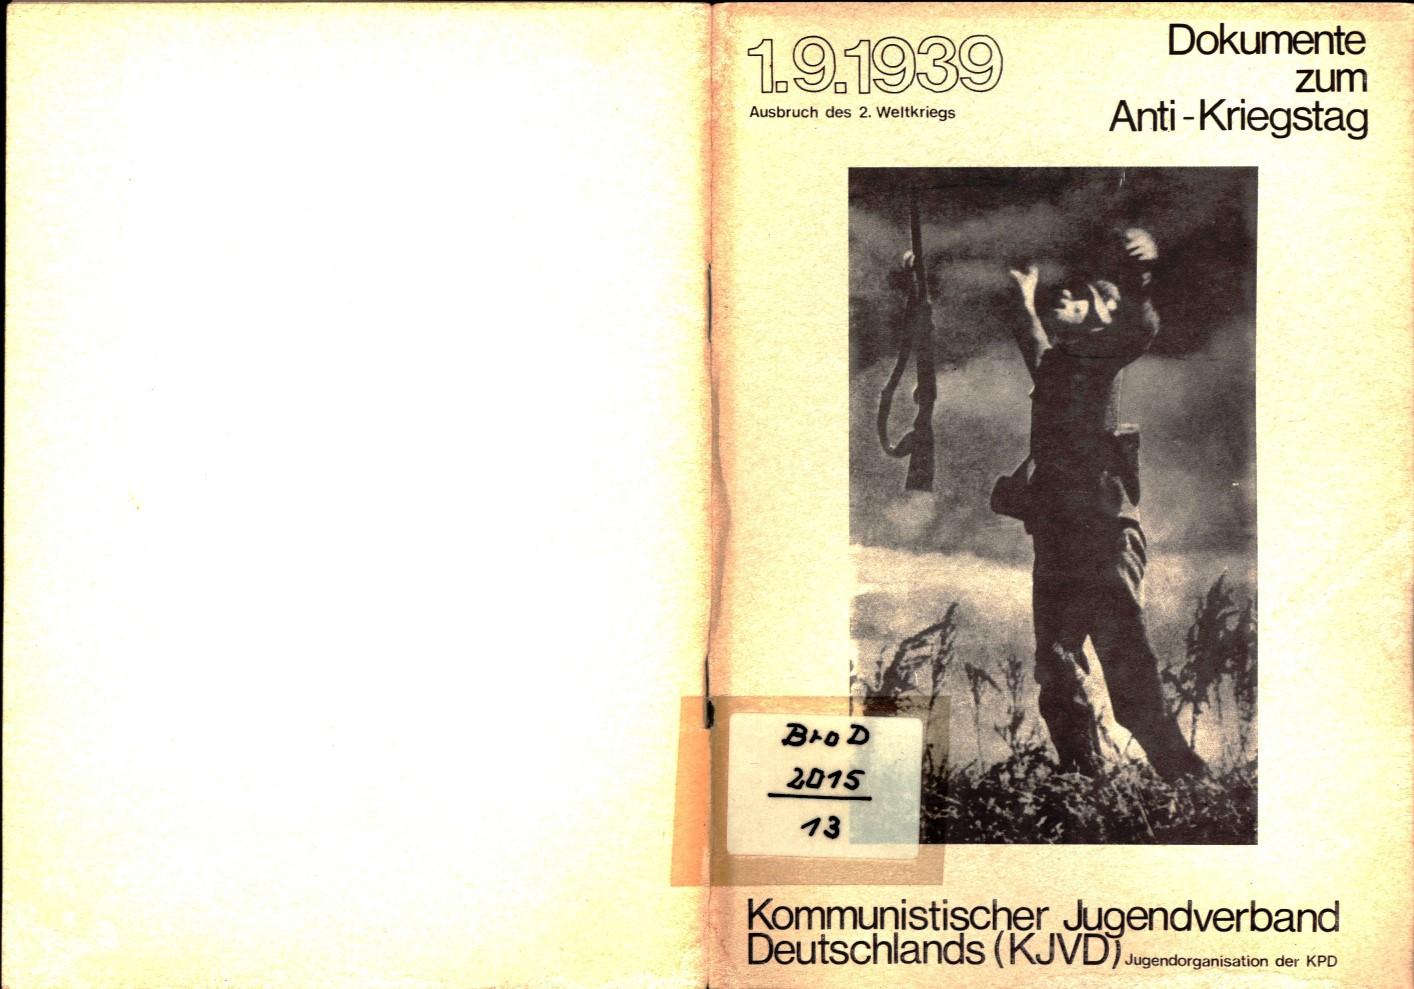 KJVD_1979_Dokumente_zum_Antikriegstag_01